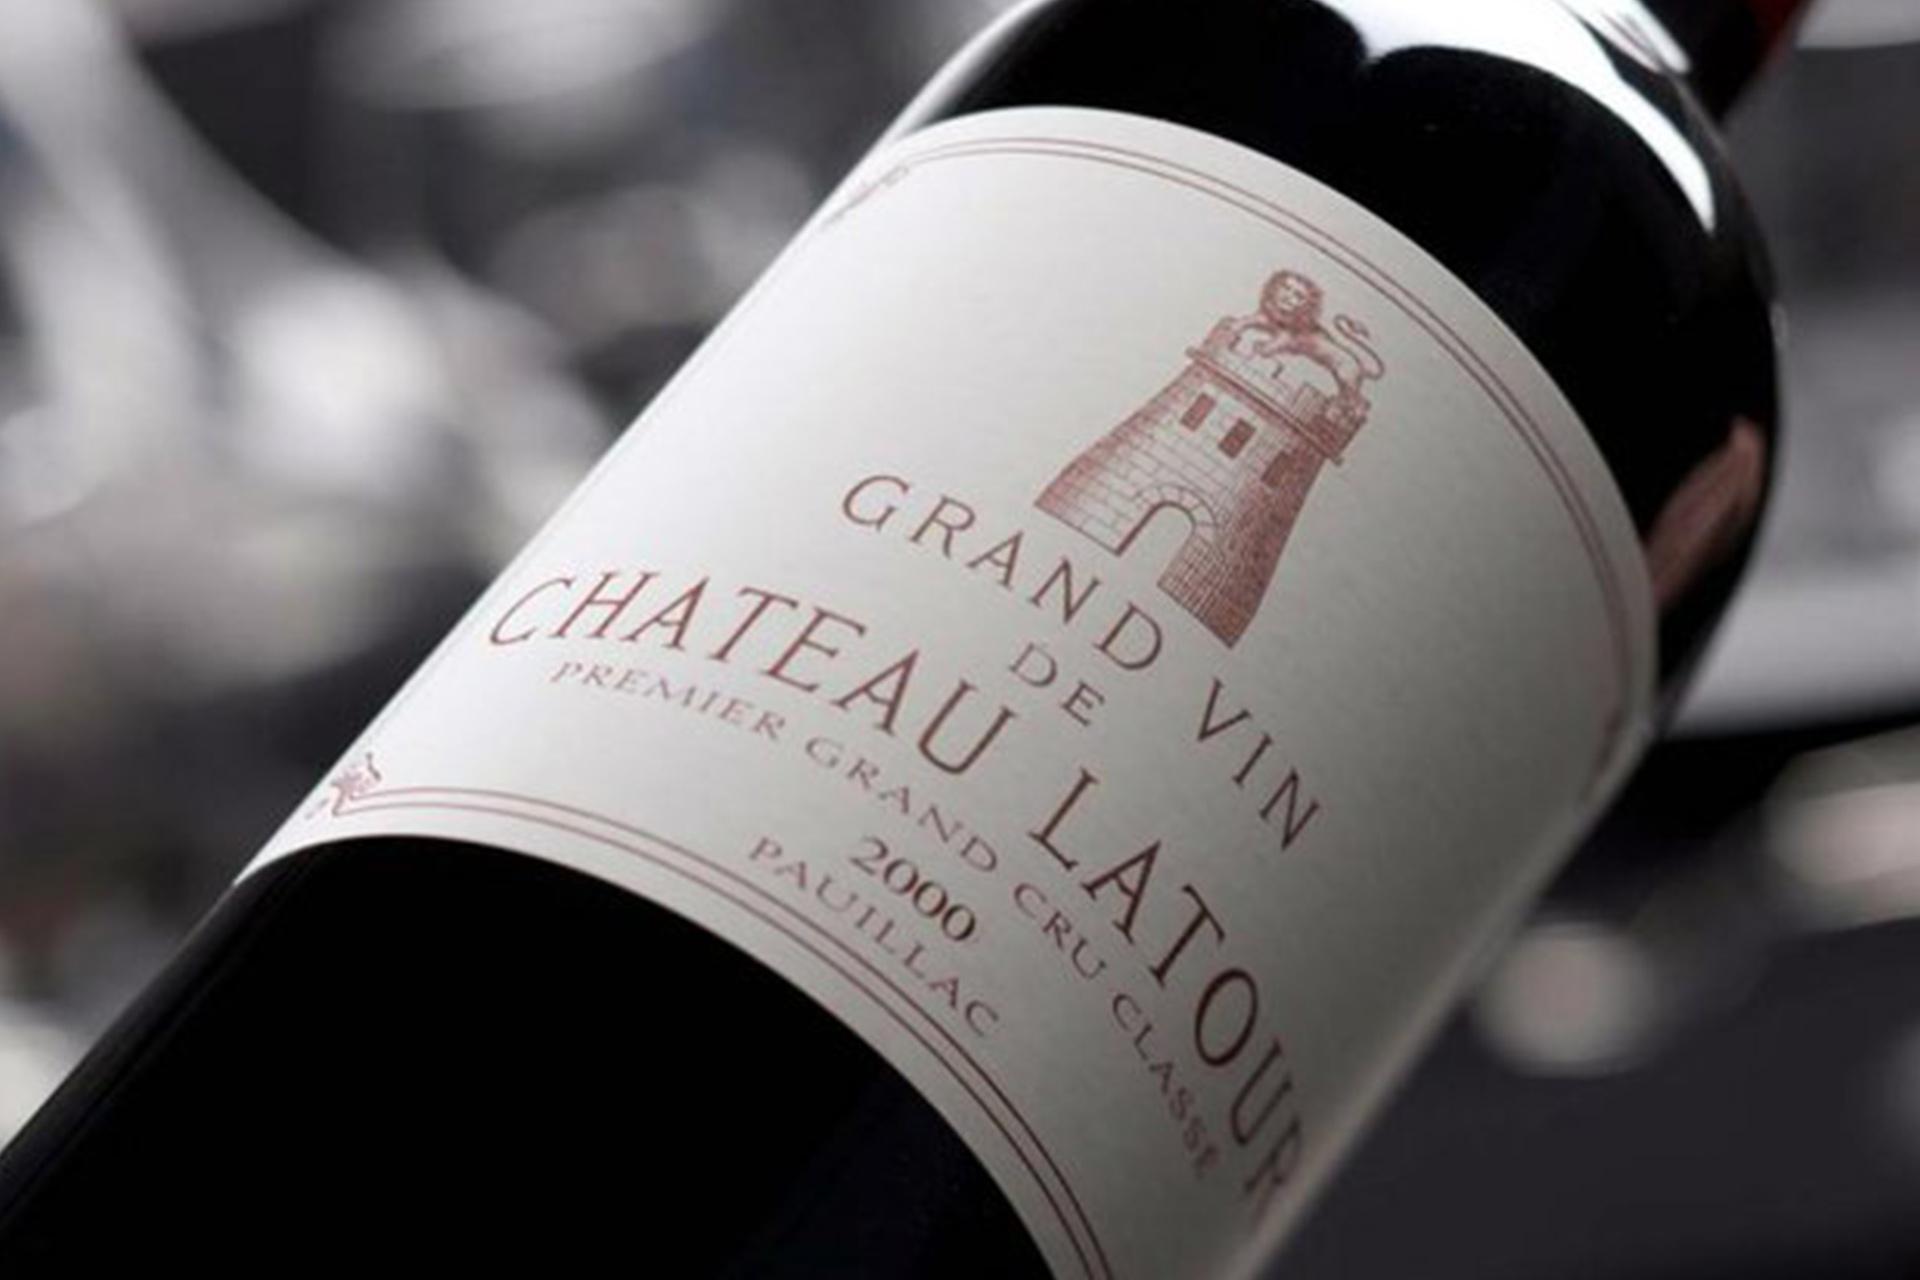 Château Latour - アペロ ワインバー オーガニックワインxフランス家庭料理 - 東京都港区南青山3-4-6 / apéro WINEBAR - vins et petits plats français